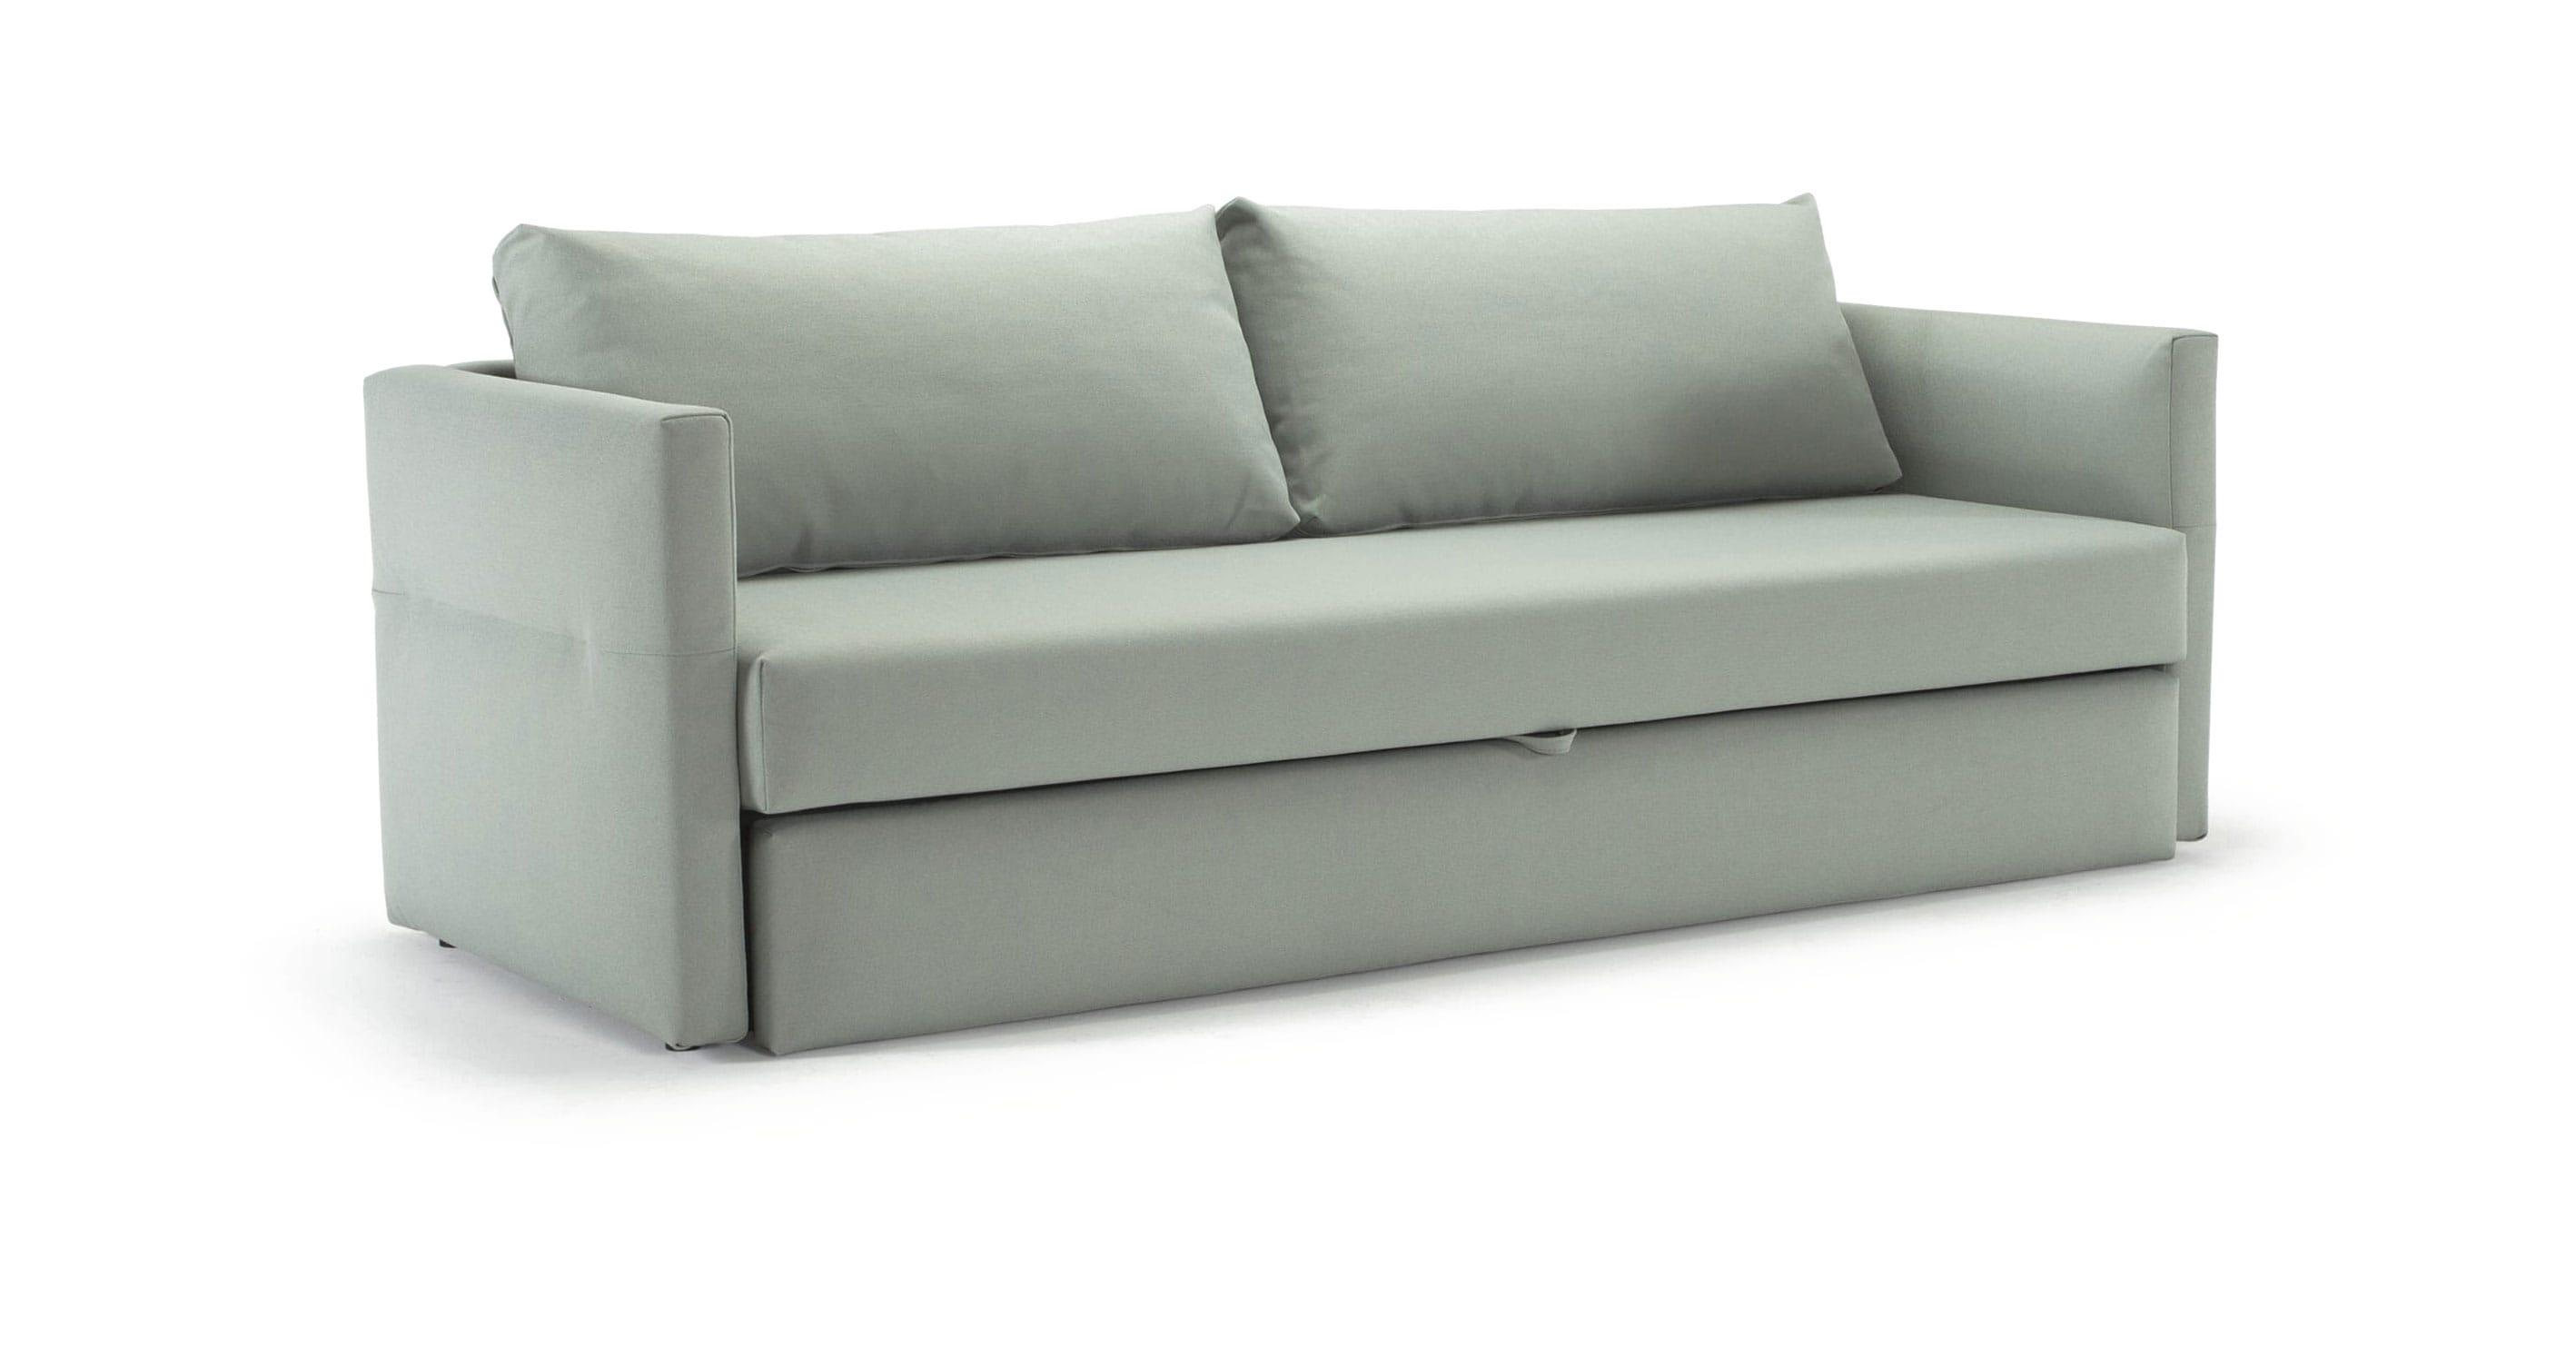 Toke Sofa Bed Full Size Coastal Nordic Sky By Innovation